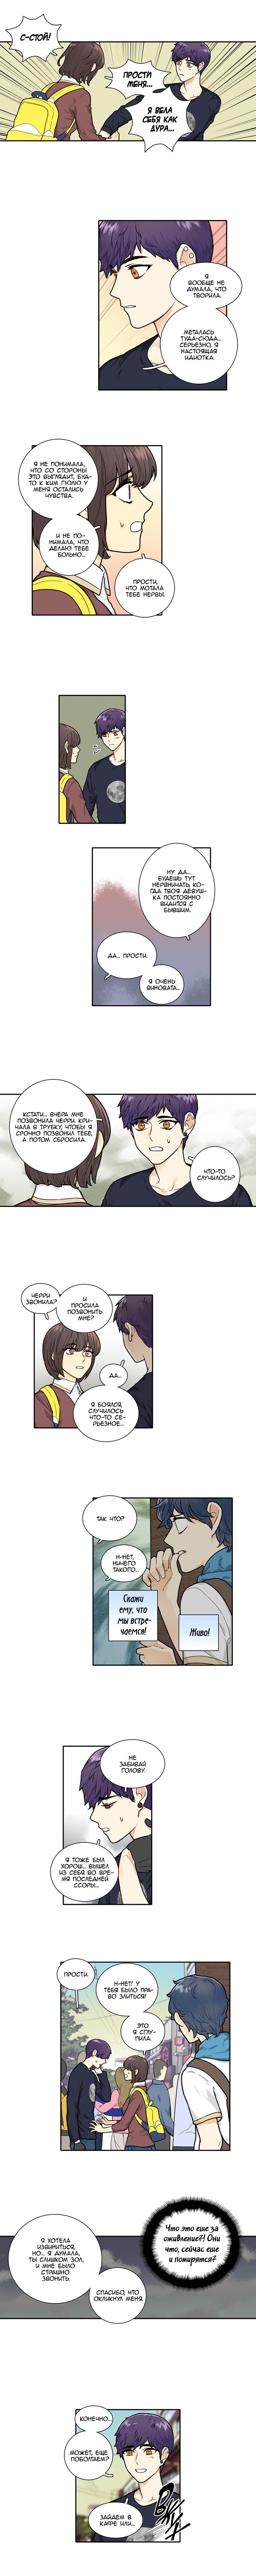 https://r1.ninemanga.com/comics/pic2/41/21609/314355/1481656527783.jpg Page 5